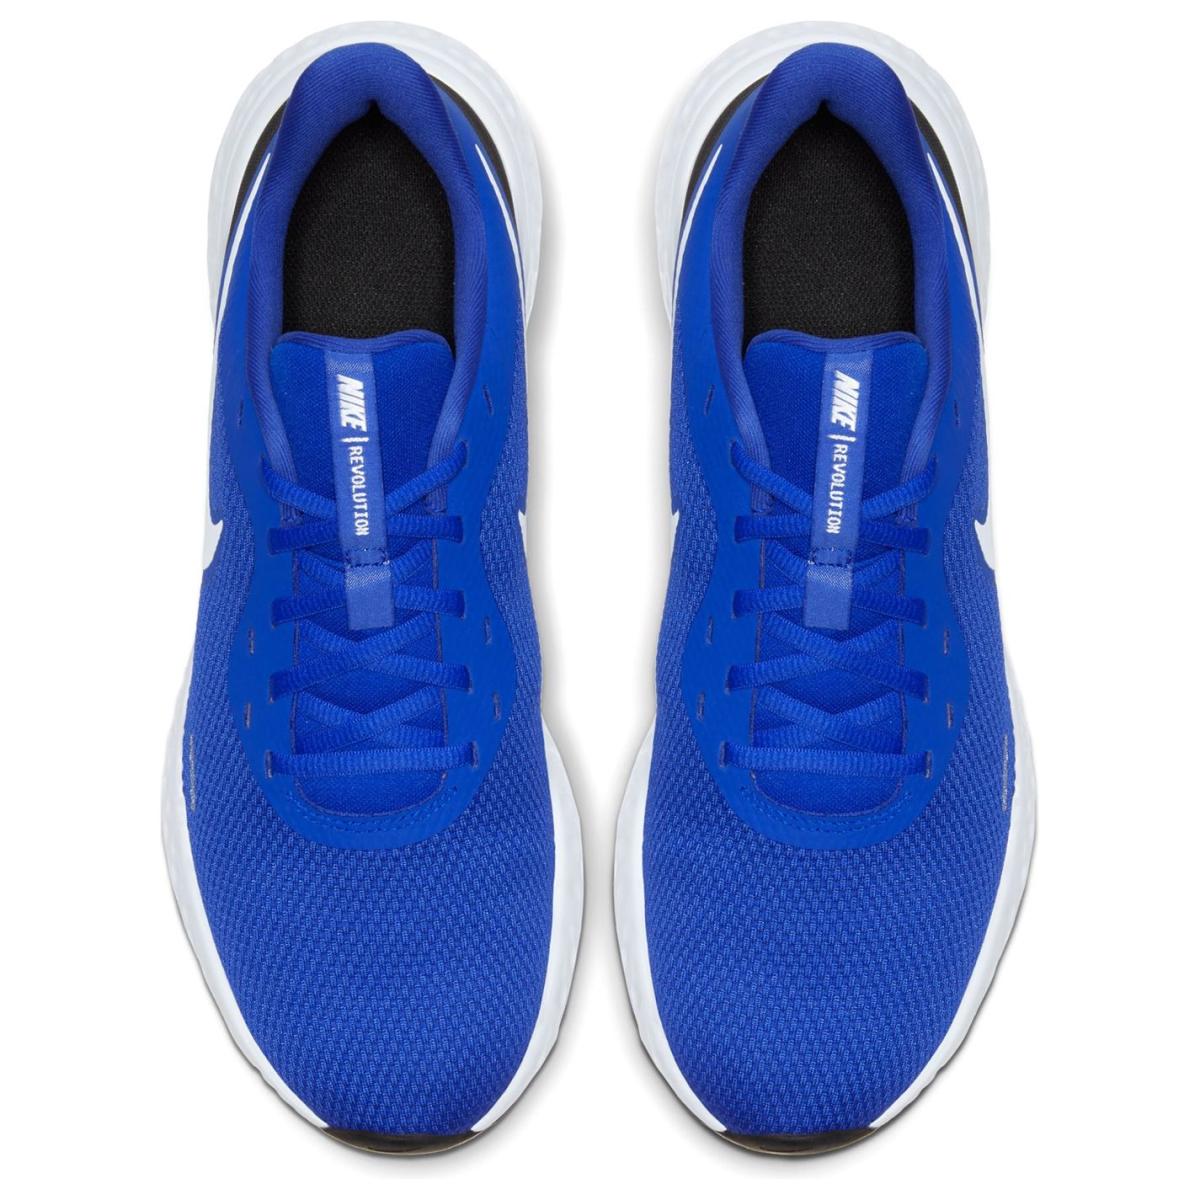 Nike Revolution Turnschuhe Herren Sneaker Sportschuhe Laufschuhe 1423